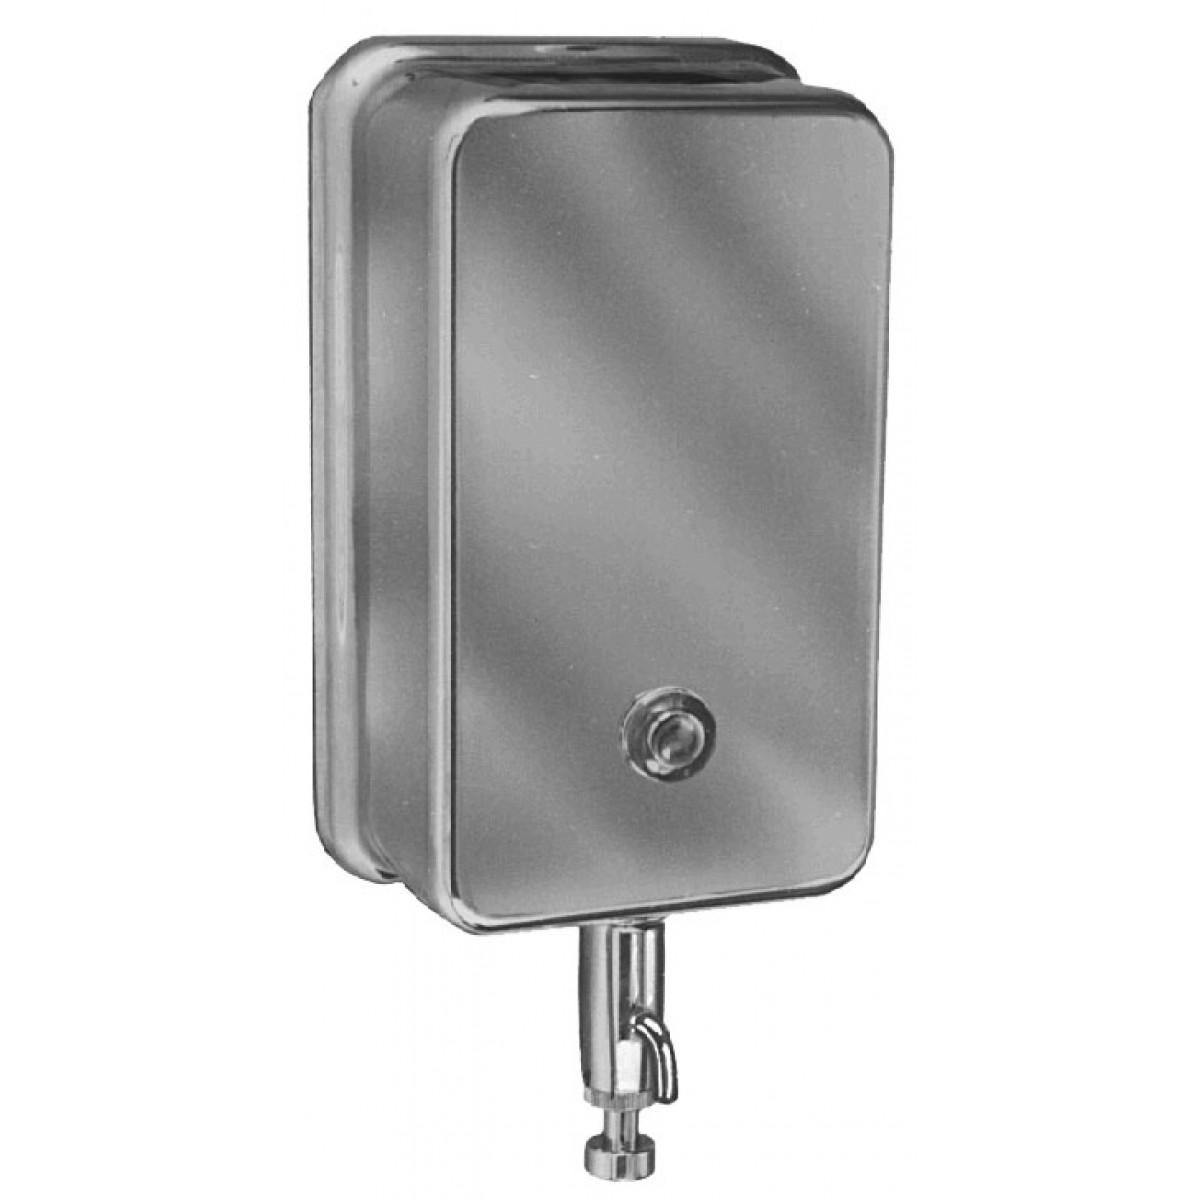 Bradley 655 Vertical Tank-Type Wall Mount Soap Dispenser (40 oz. cap.)